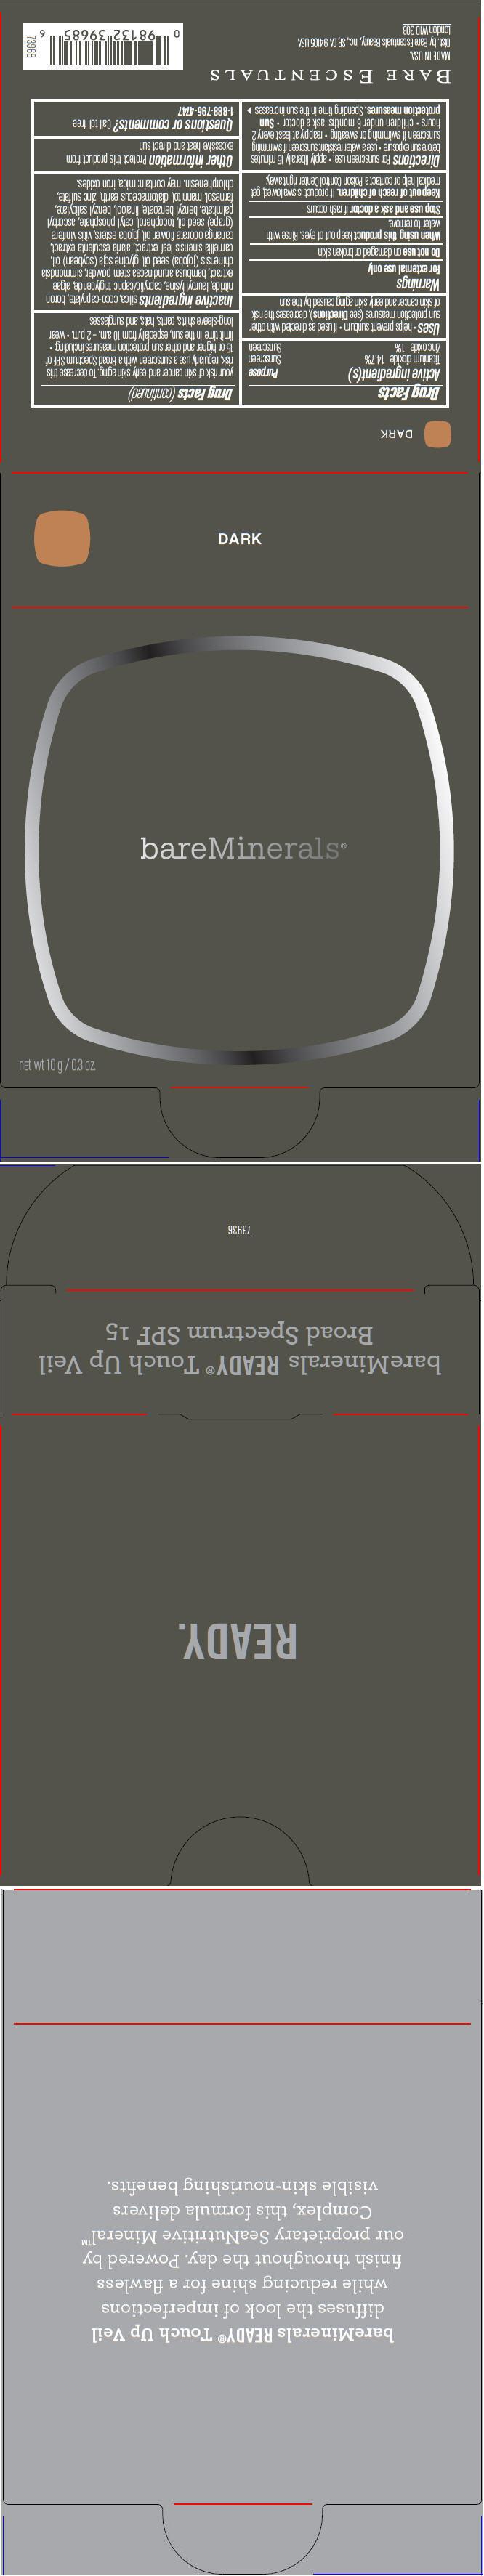 Principal Display Panel - 10 g Tray Carton - Dark